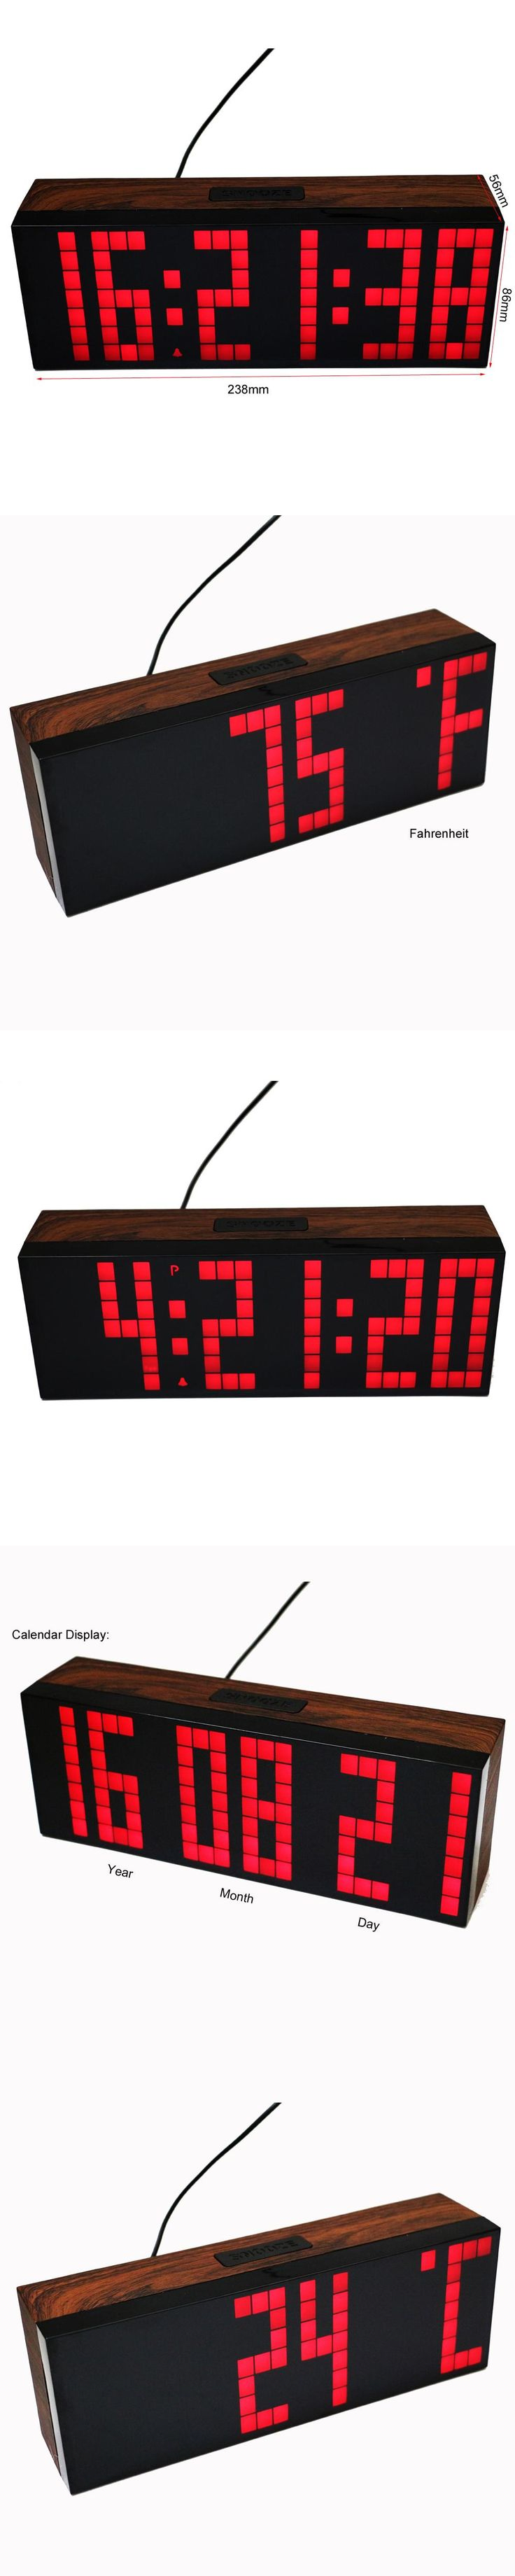 Best 25 countdown clock timer ideas on pinterest stopwatch big font led digital alarm temperature calendar wall clocks countdown timer sport timer large led display amipublicfo Choice Image